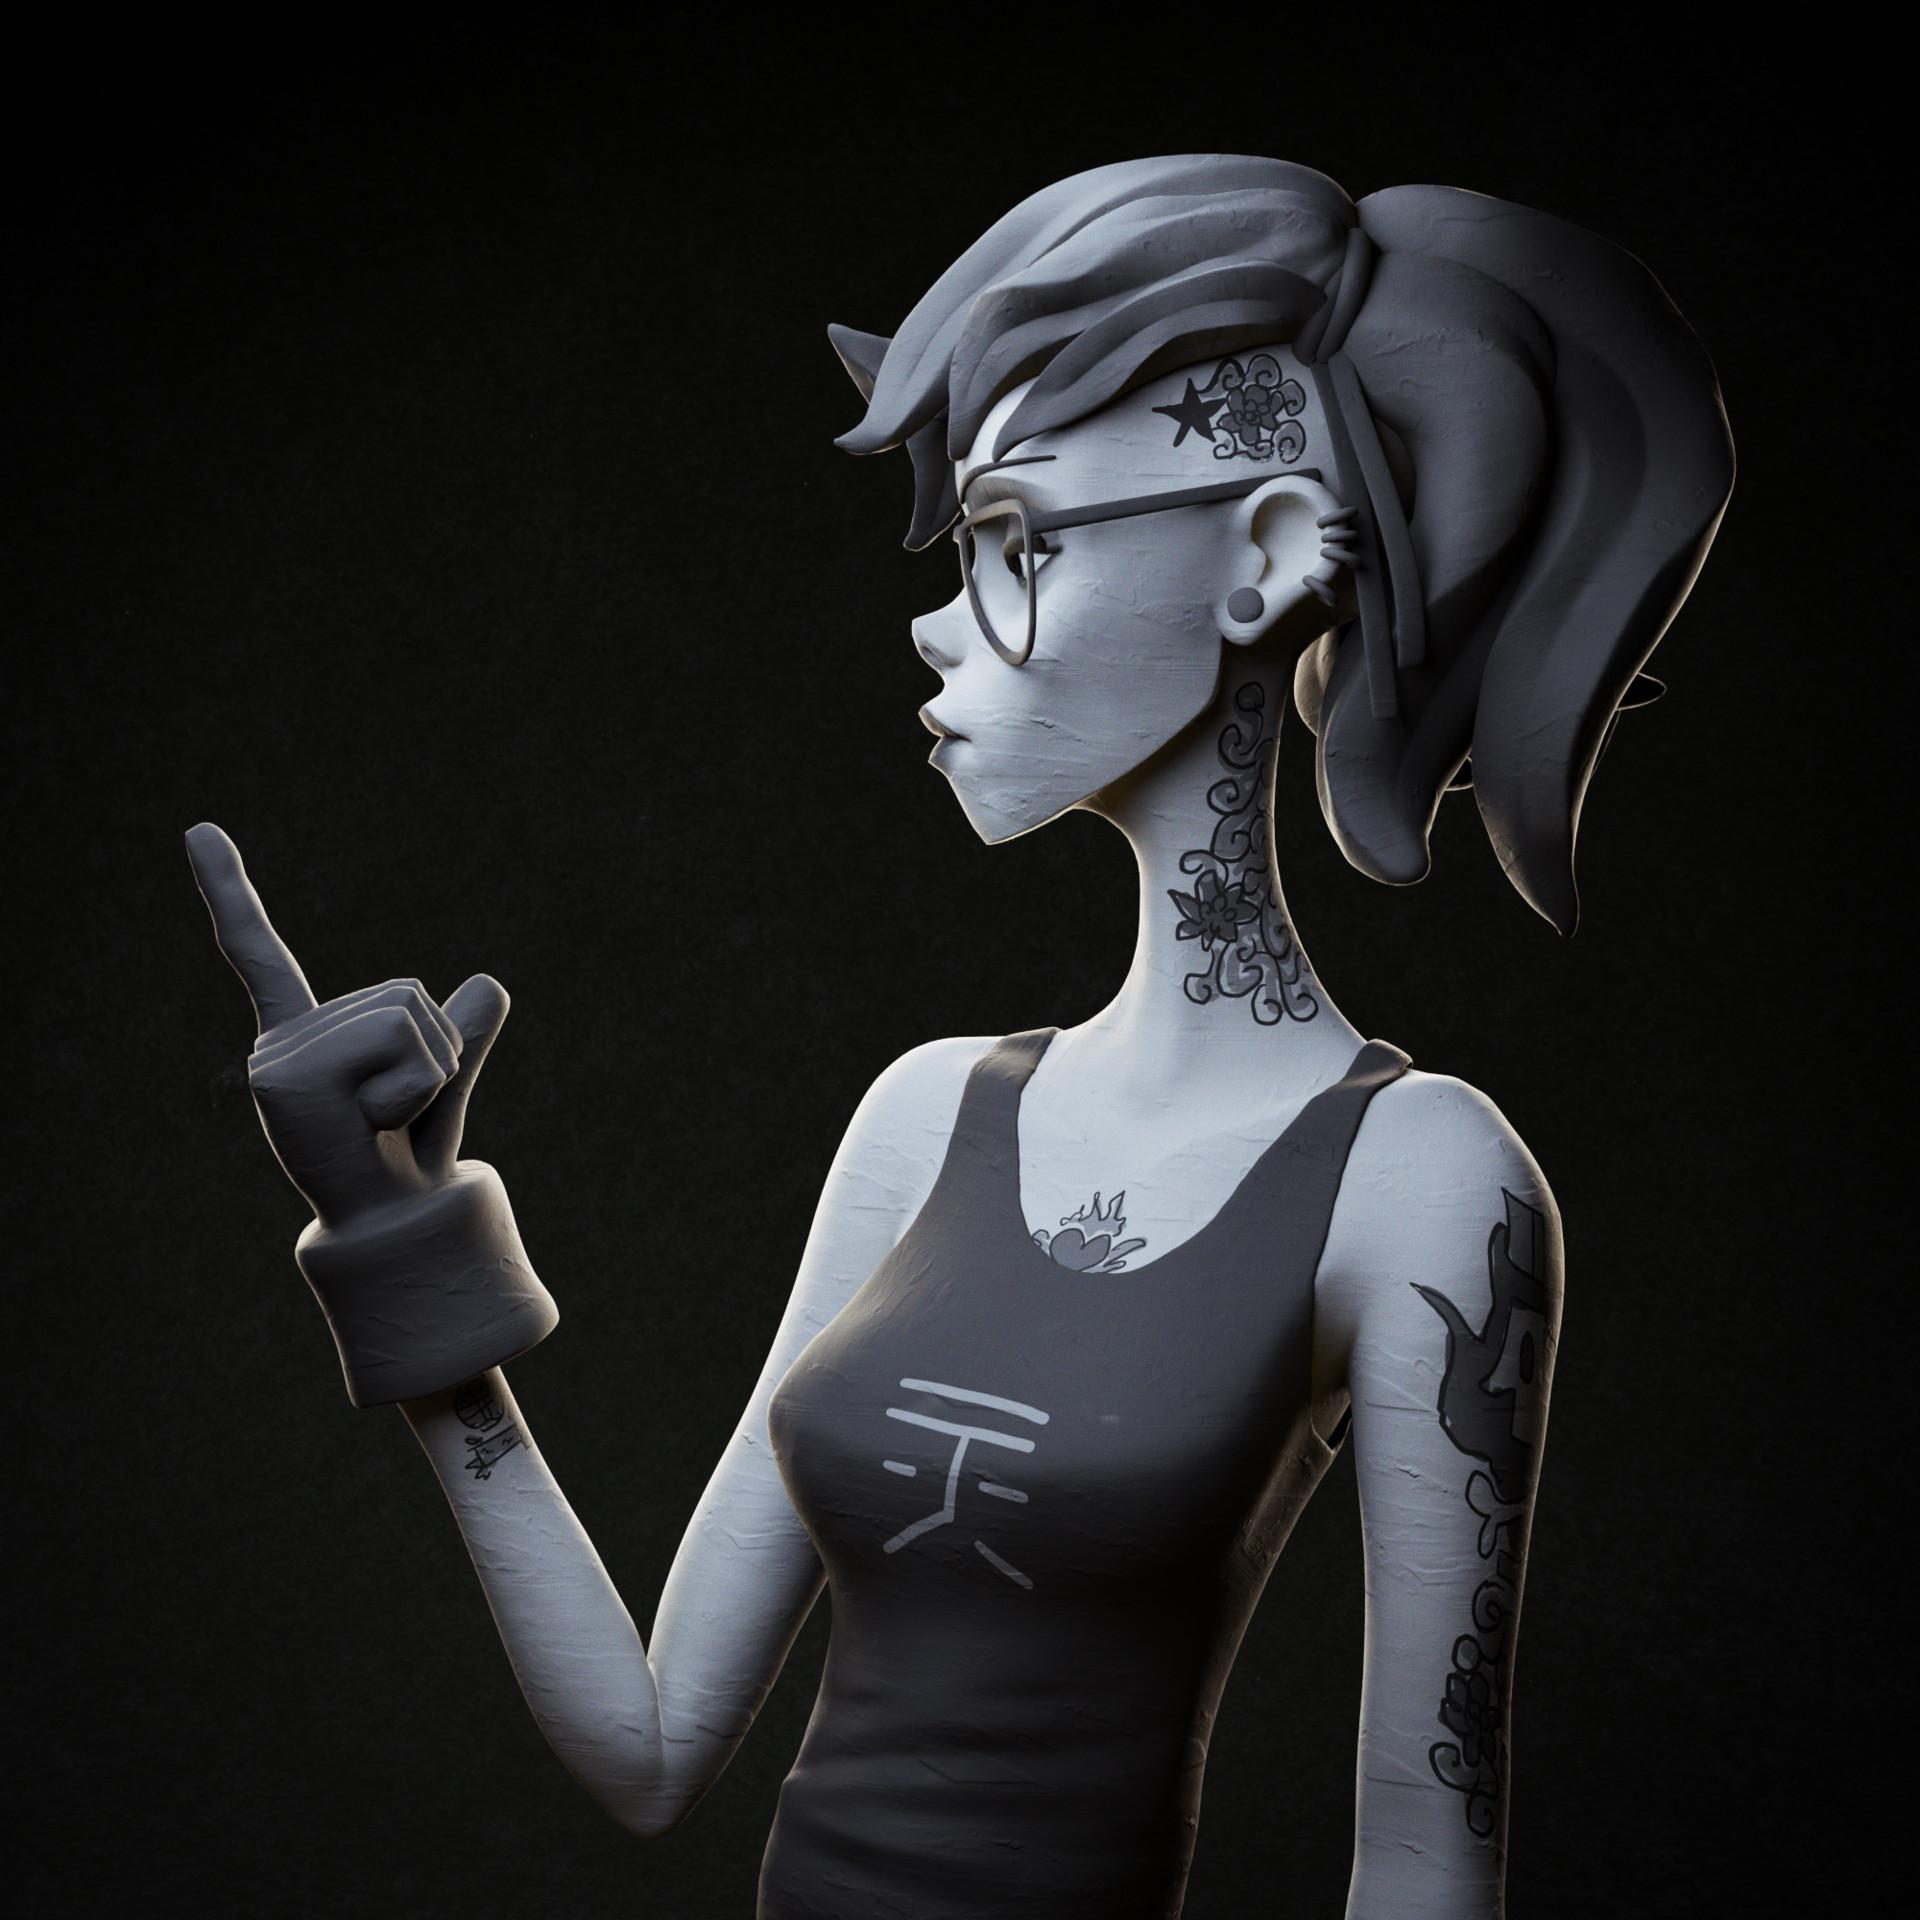 Day 13: Punk (based on an artwork by Serge Birault: https://www.artstation.com/artwork/oqJRO)